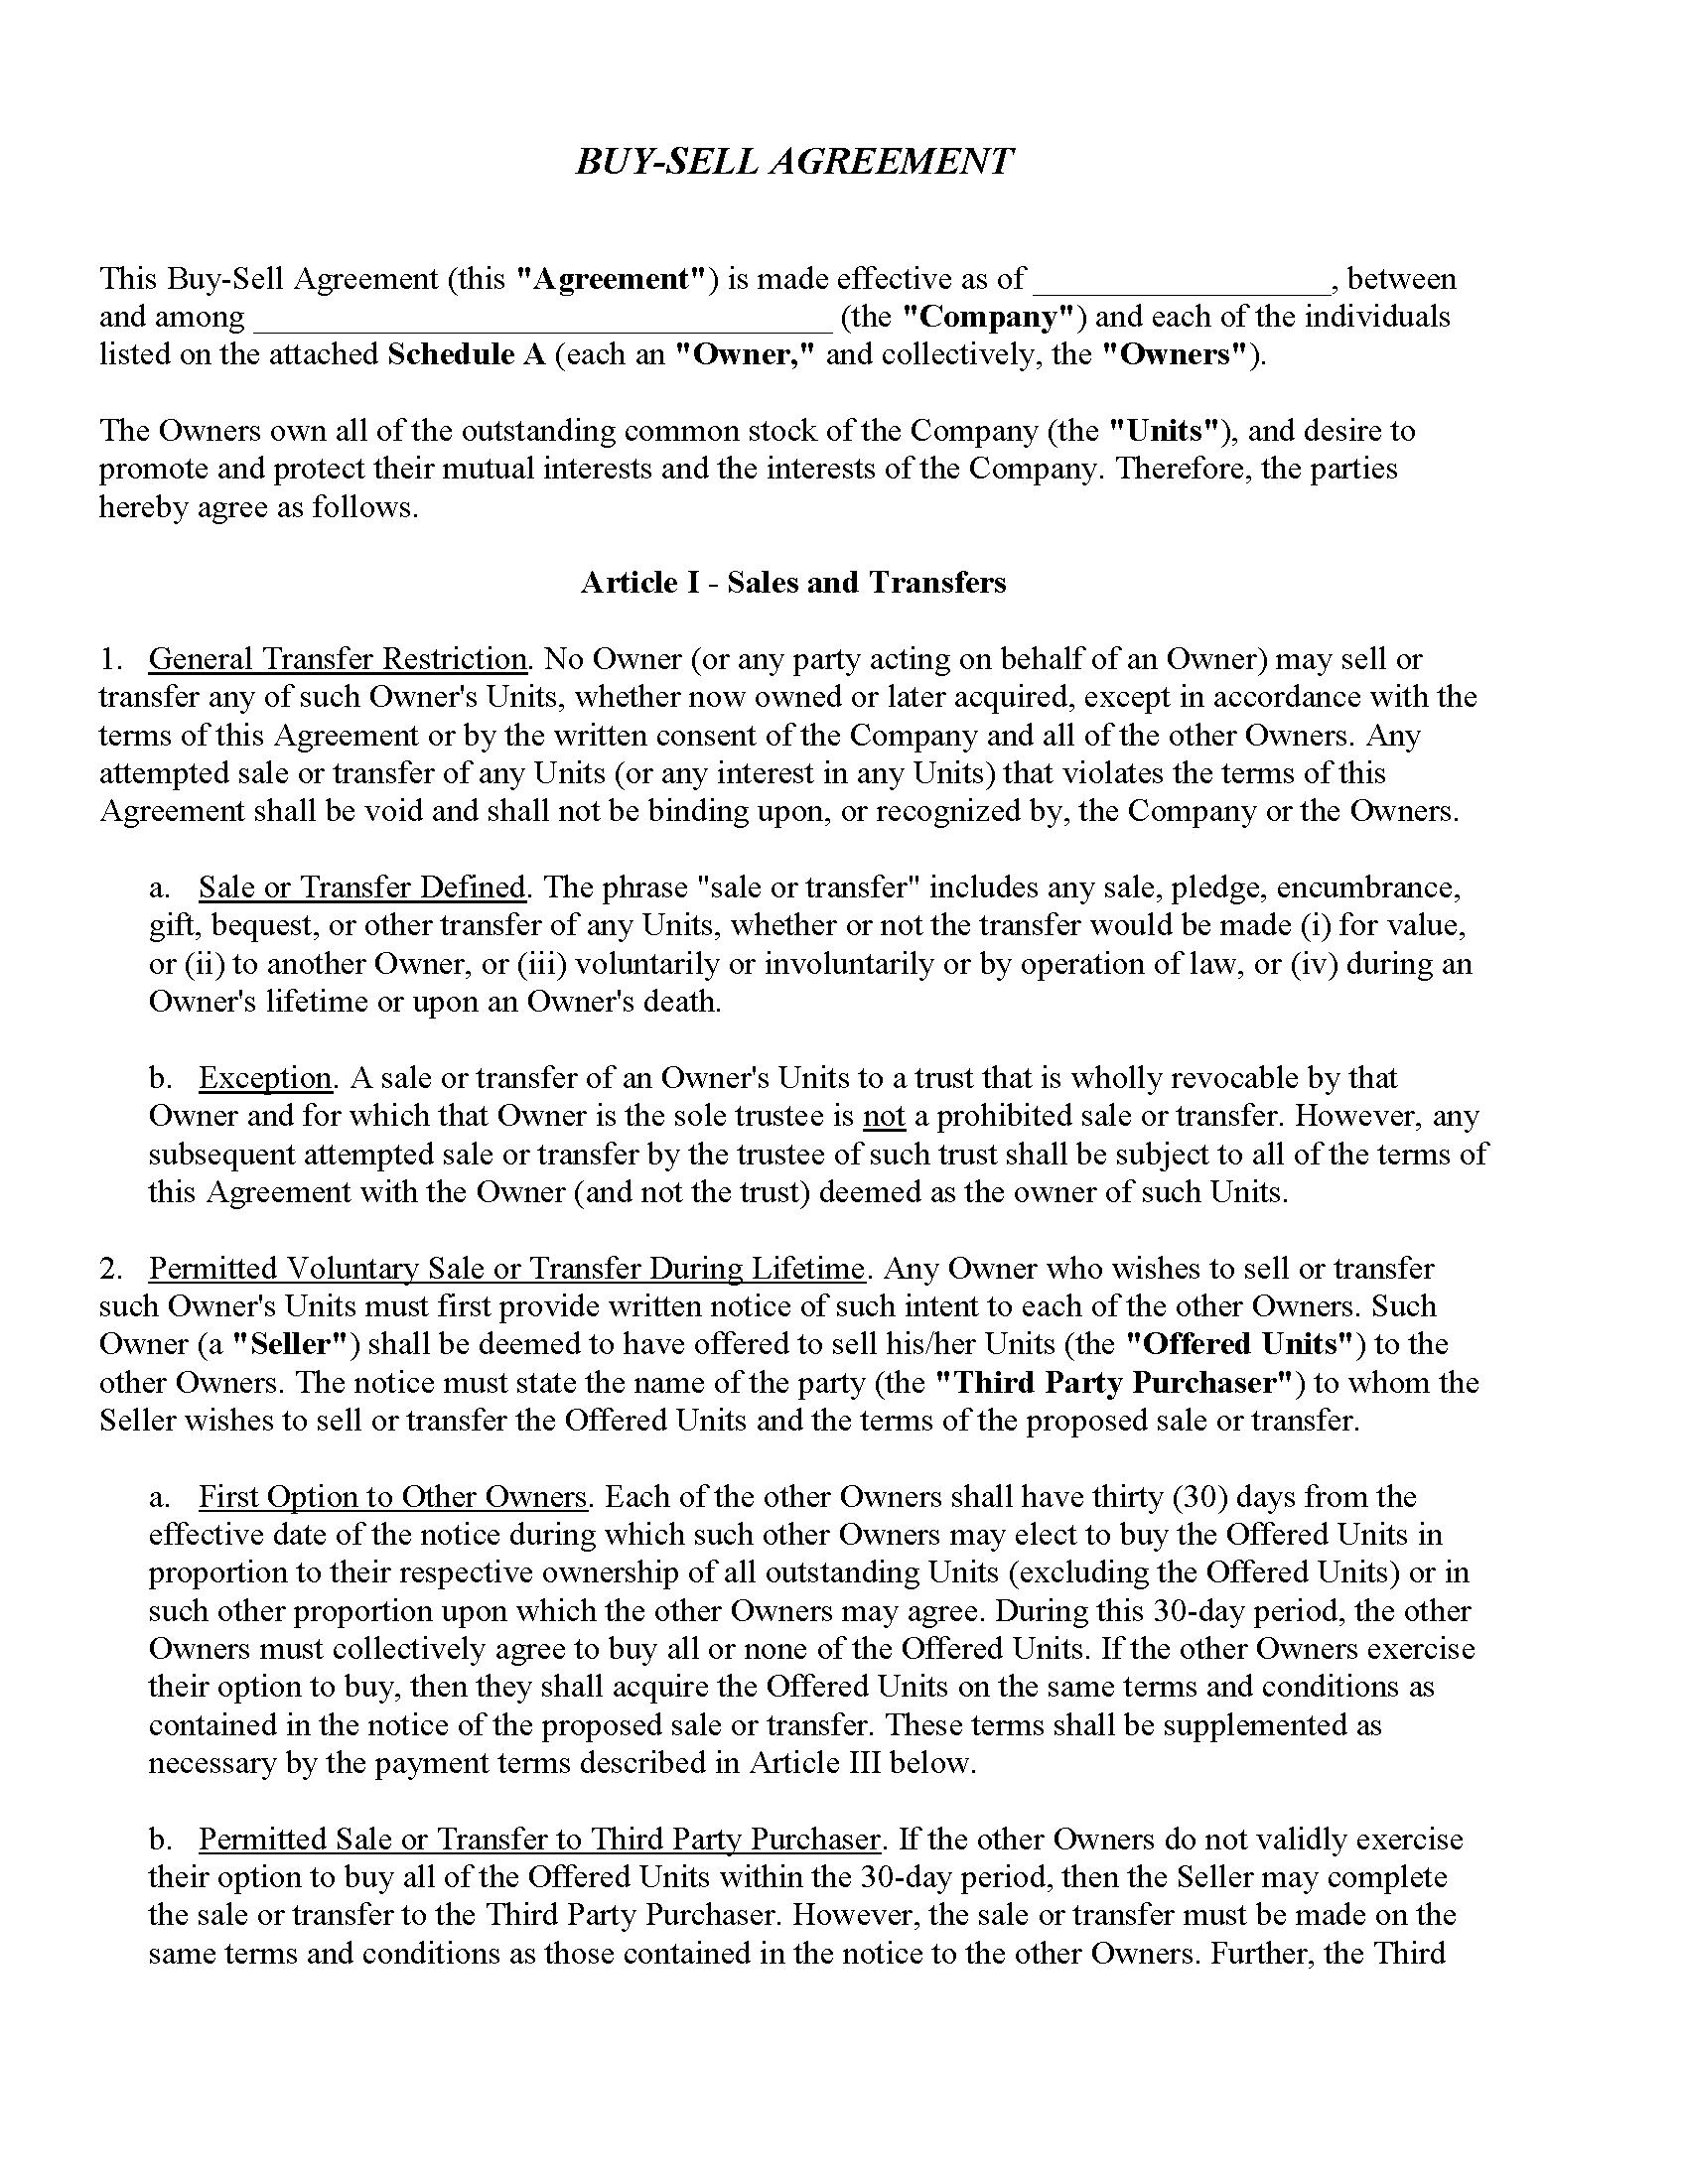 Louisiana Buy-Sell Agreement